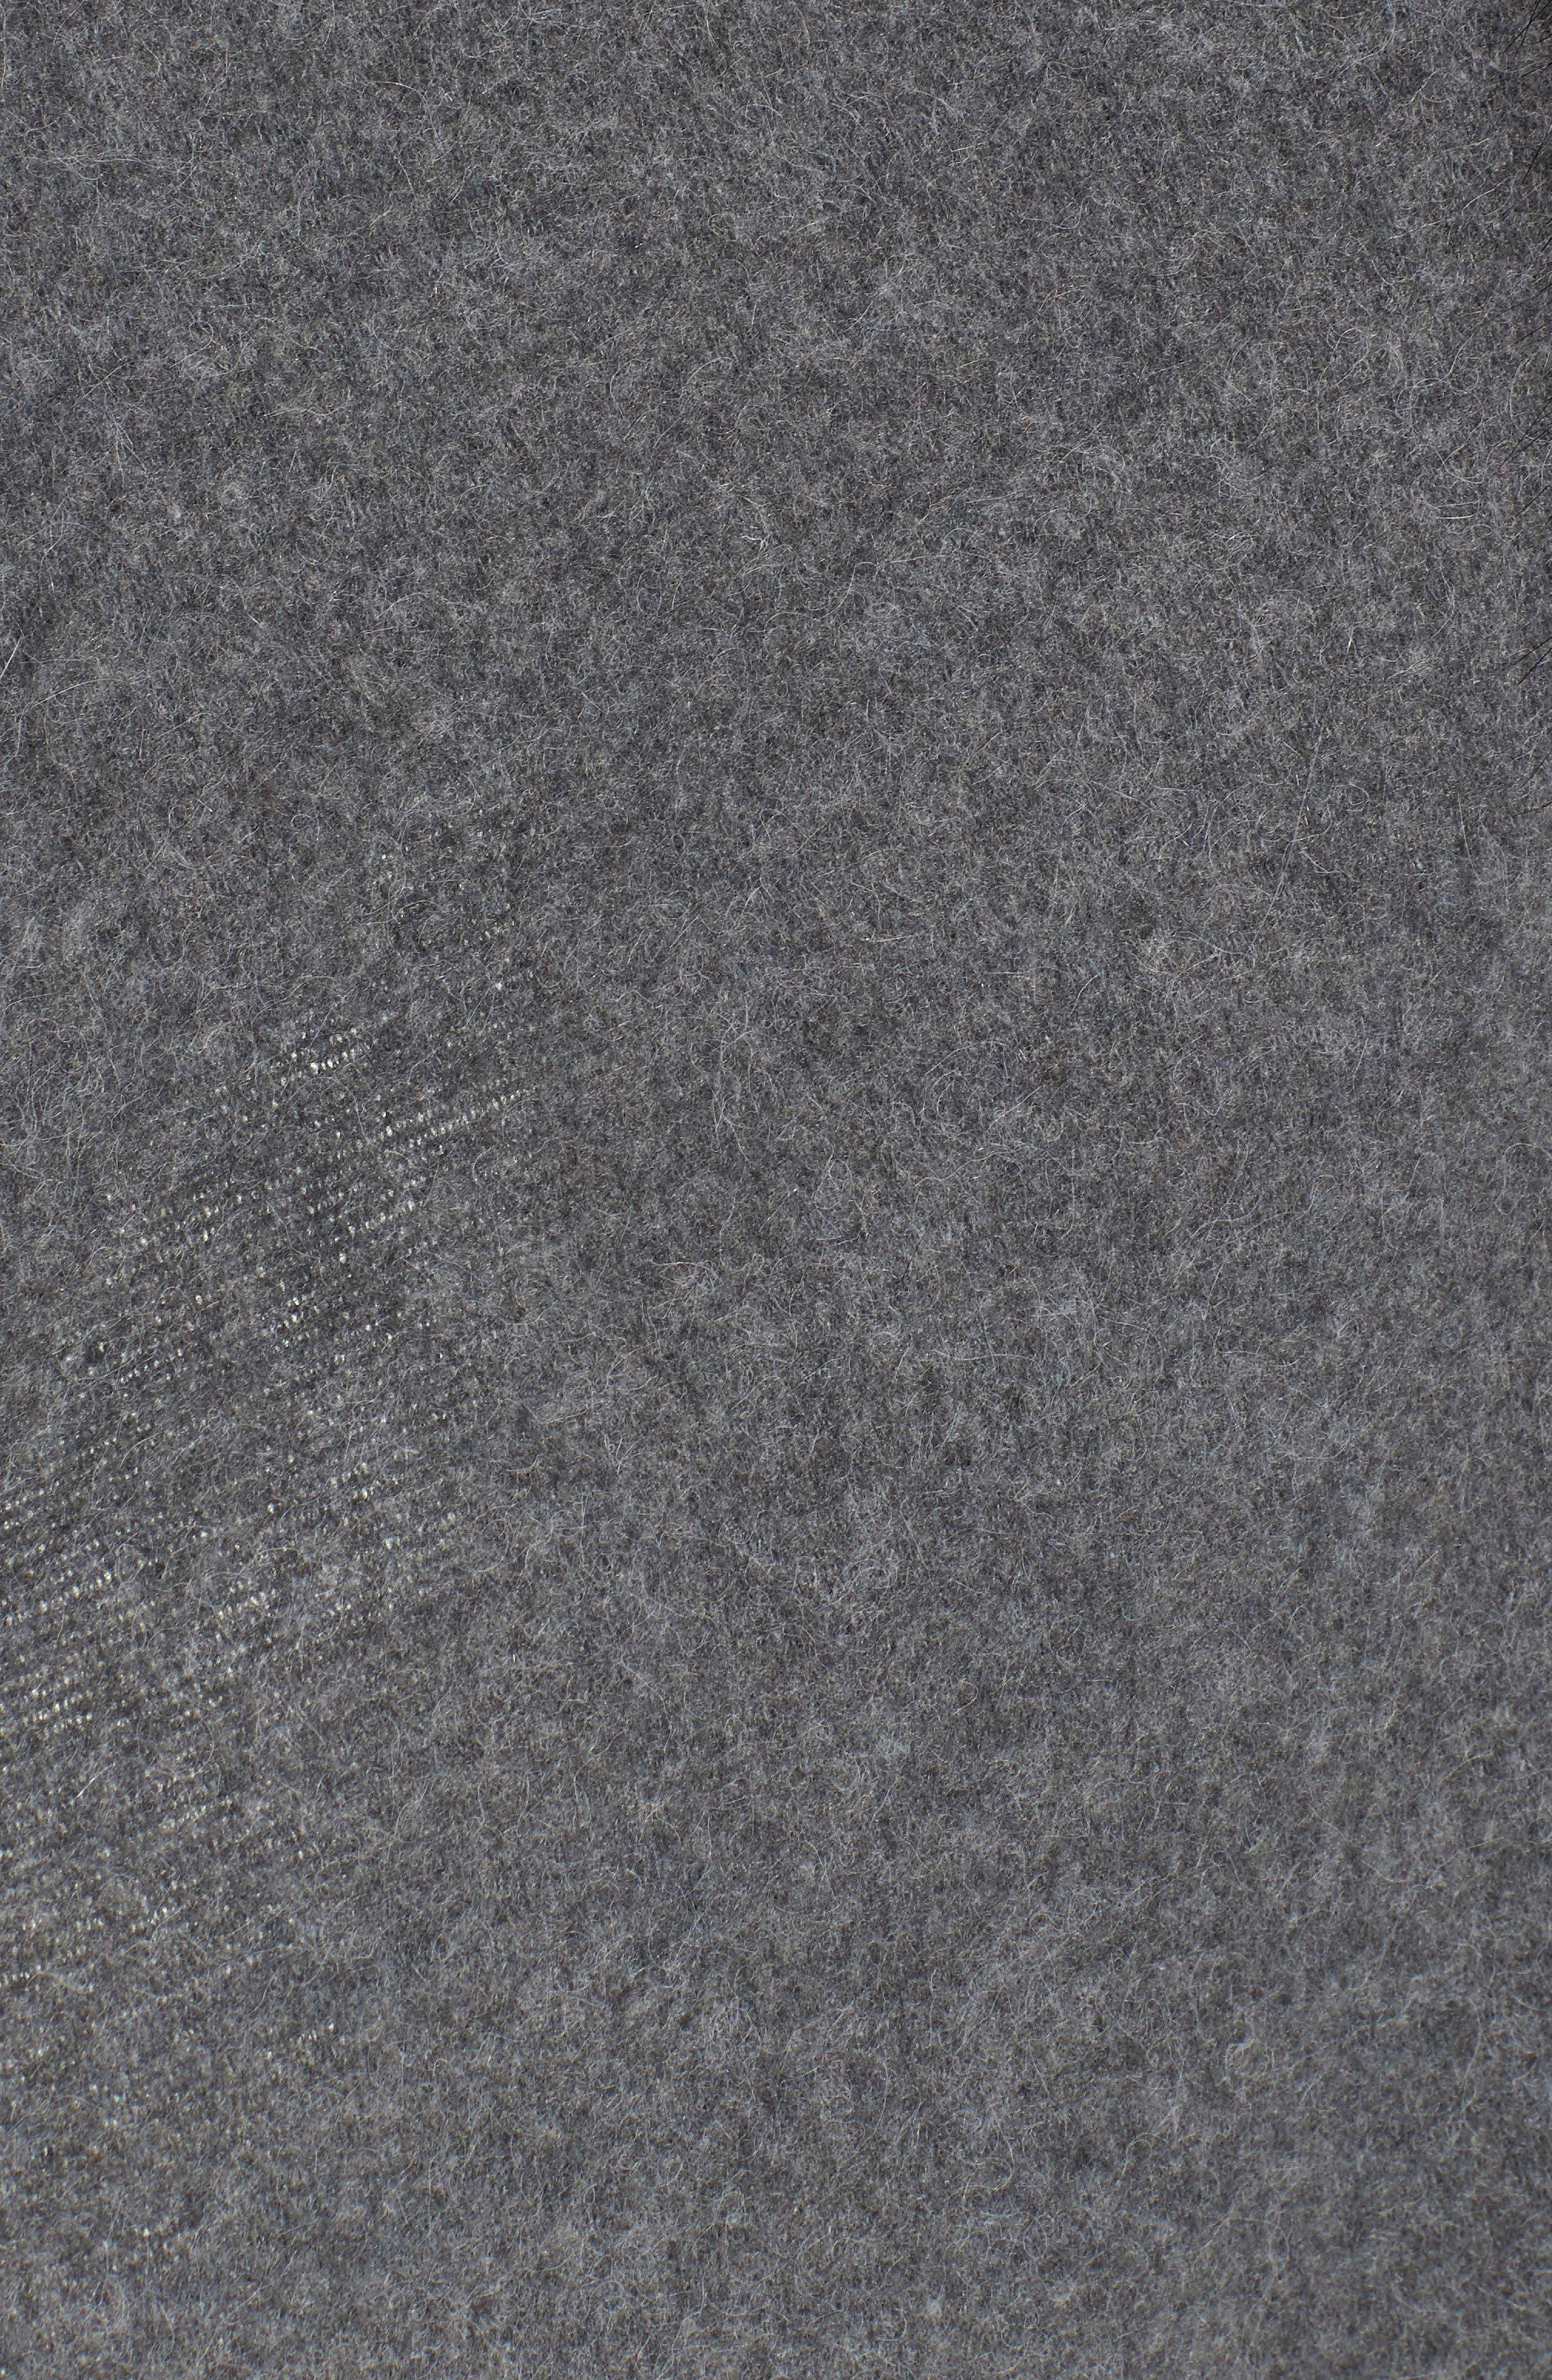 Knit Poncho with Faux Fur Trim,                             Alternate thumbnail 5, color,                             030